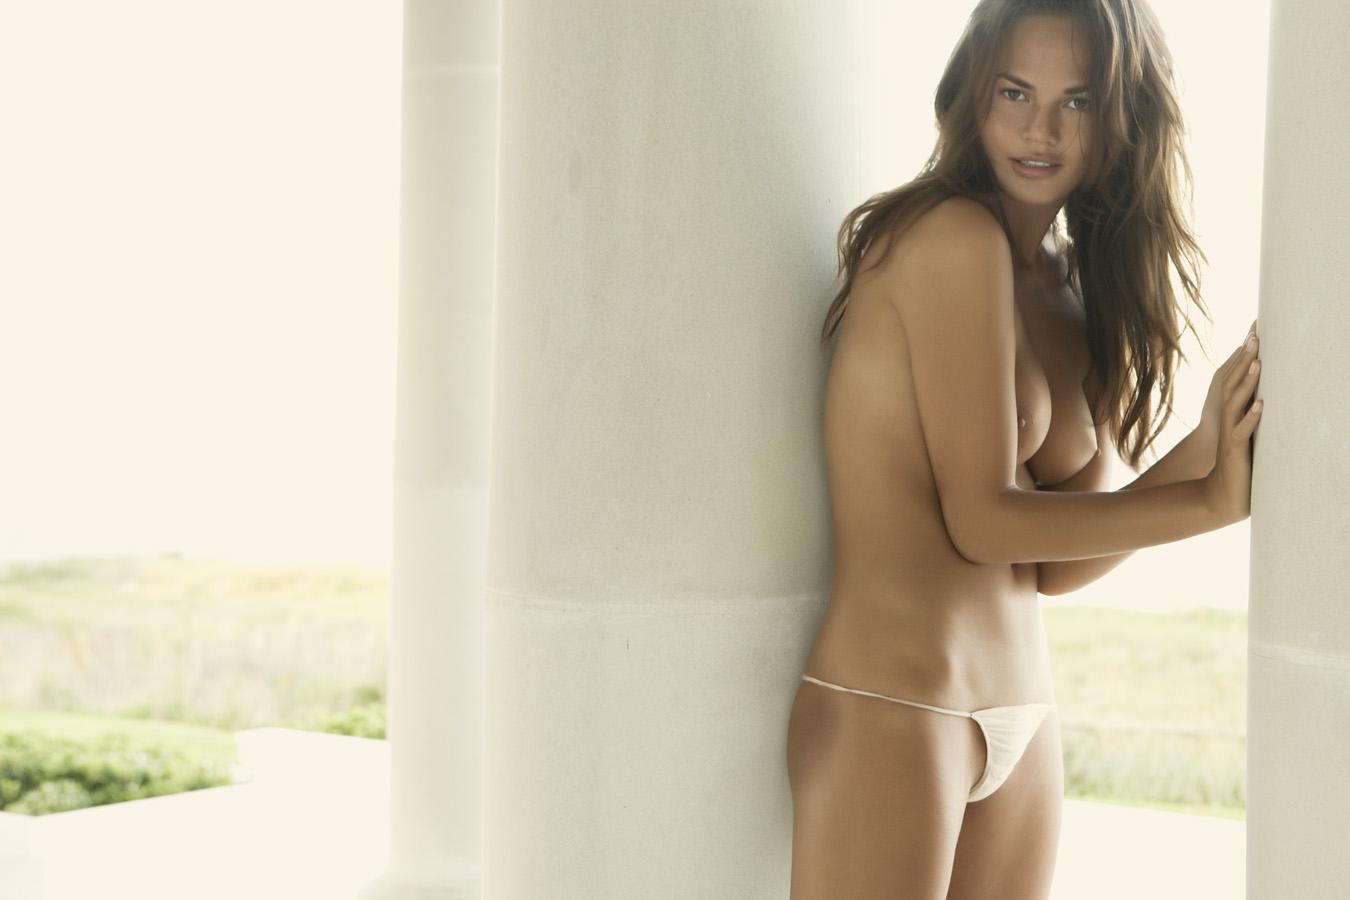 Chrissy Teigen Nude Big Boobs and Very Tight Panties